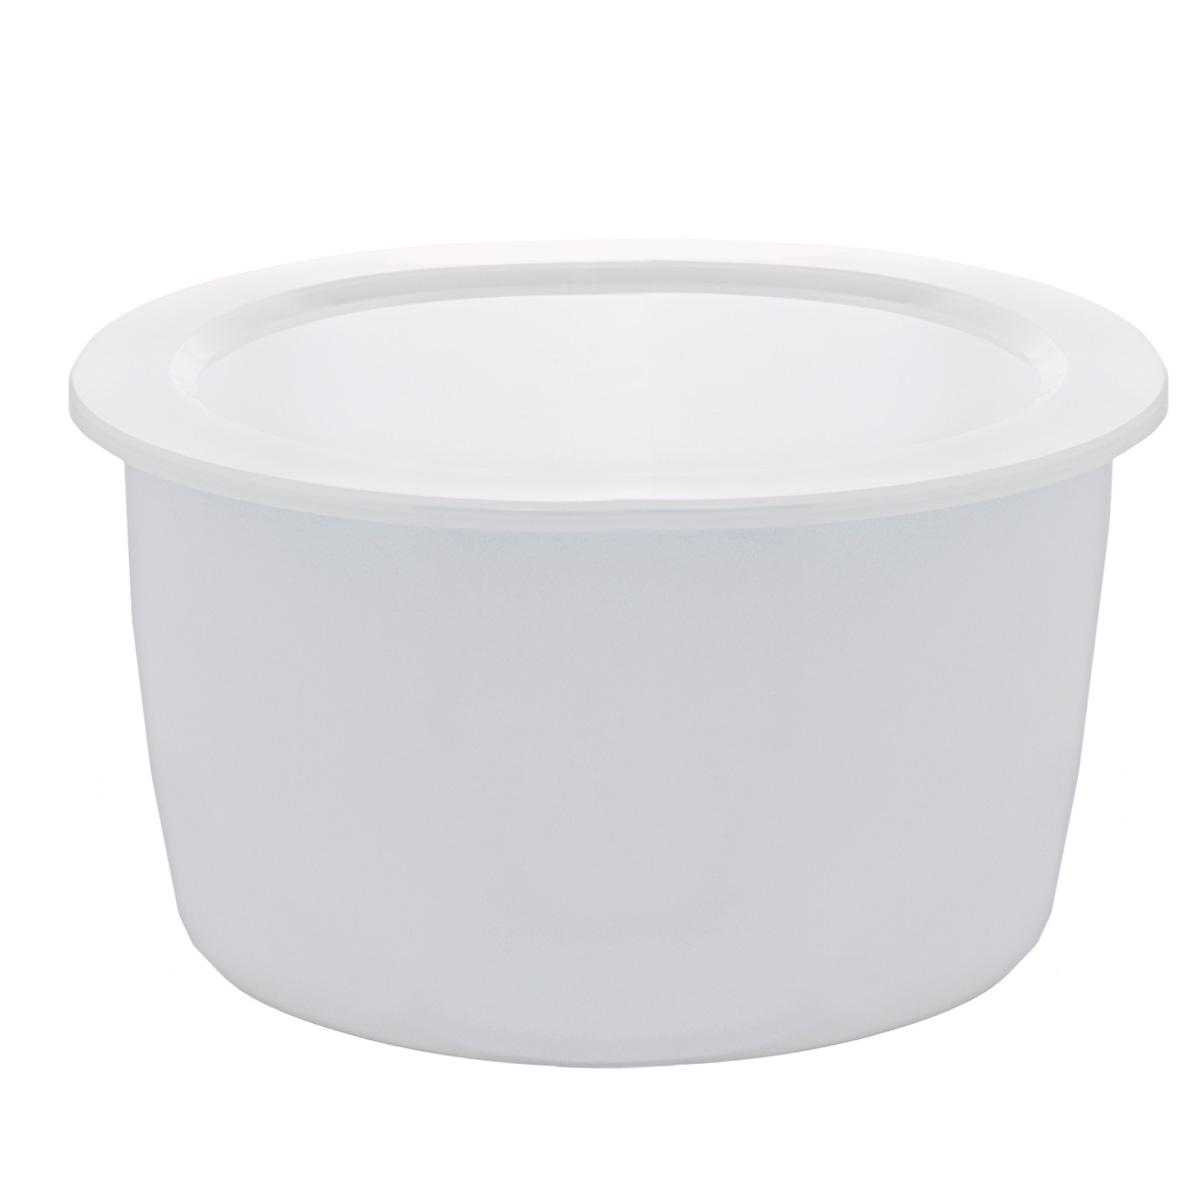 все цены на Steba AS 4 сменная чаша для мультиварки DD1/2 онлайн